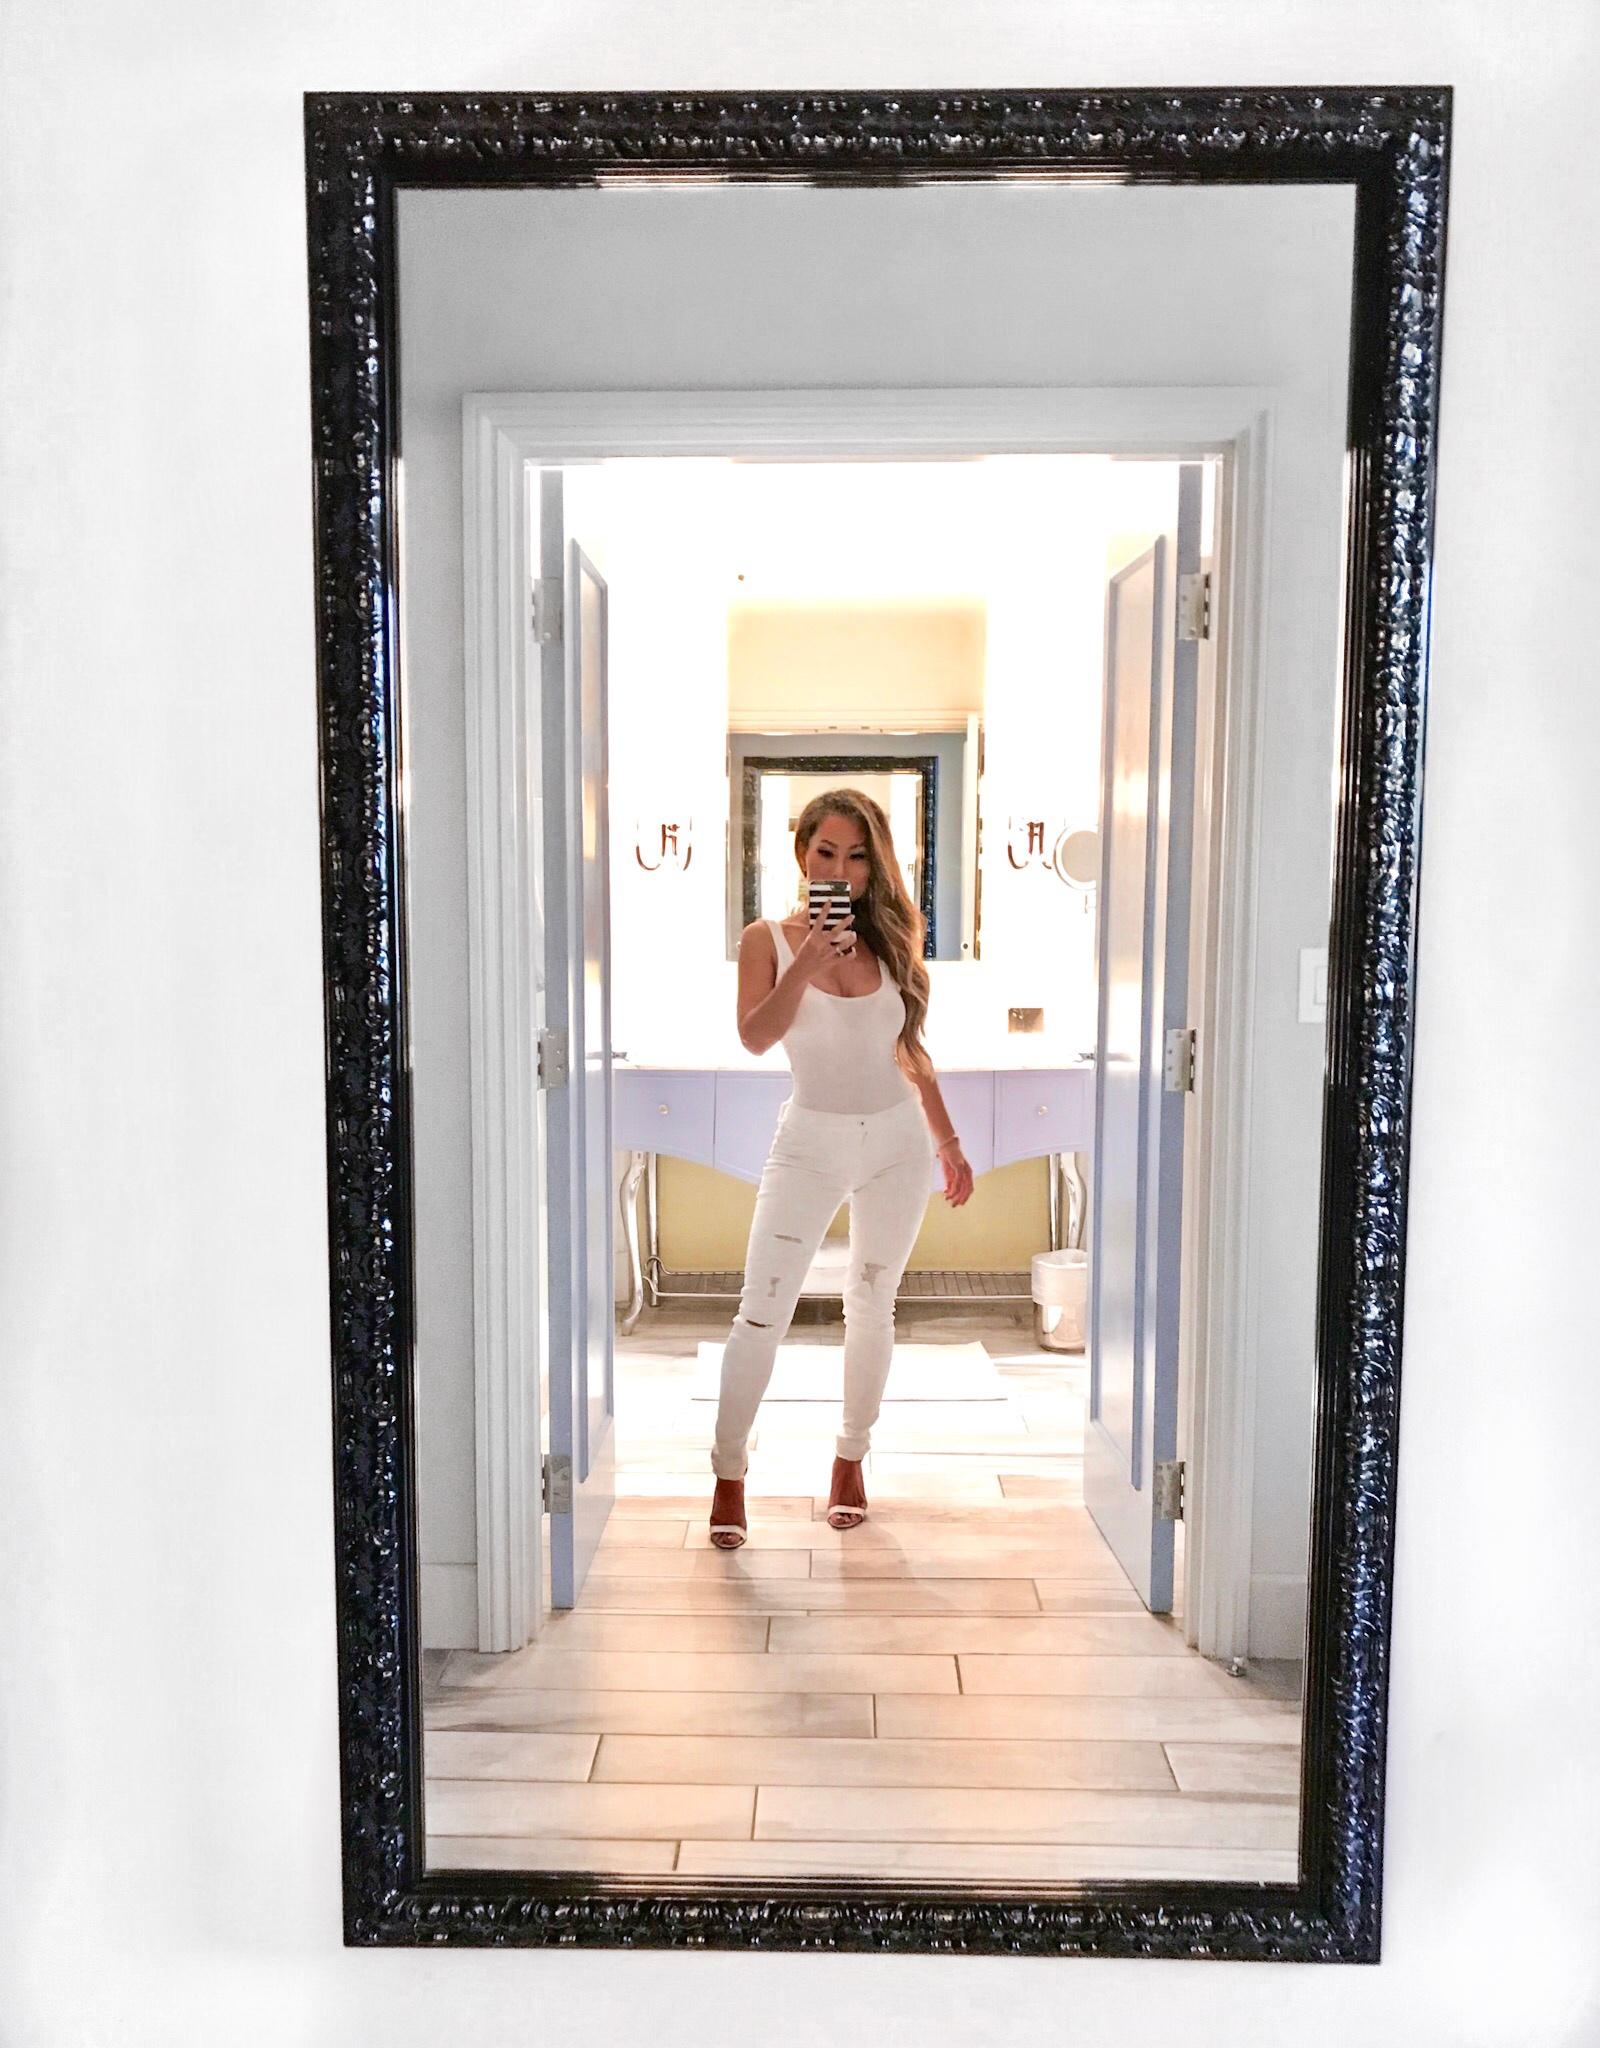 Grand bohemian Hotel Charleston, White jeans and a white bodysuit at Grand Bohemian Hotel